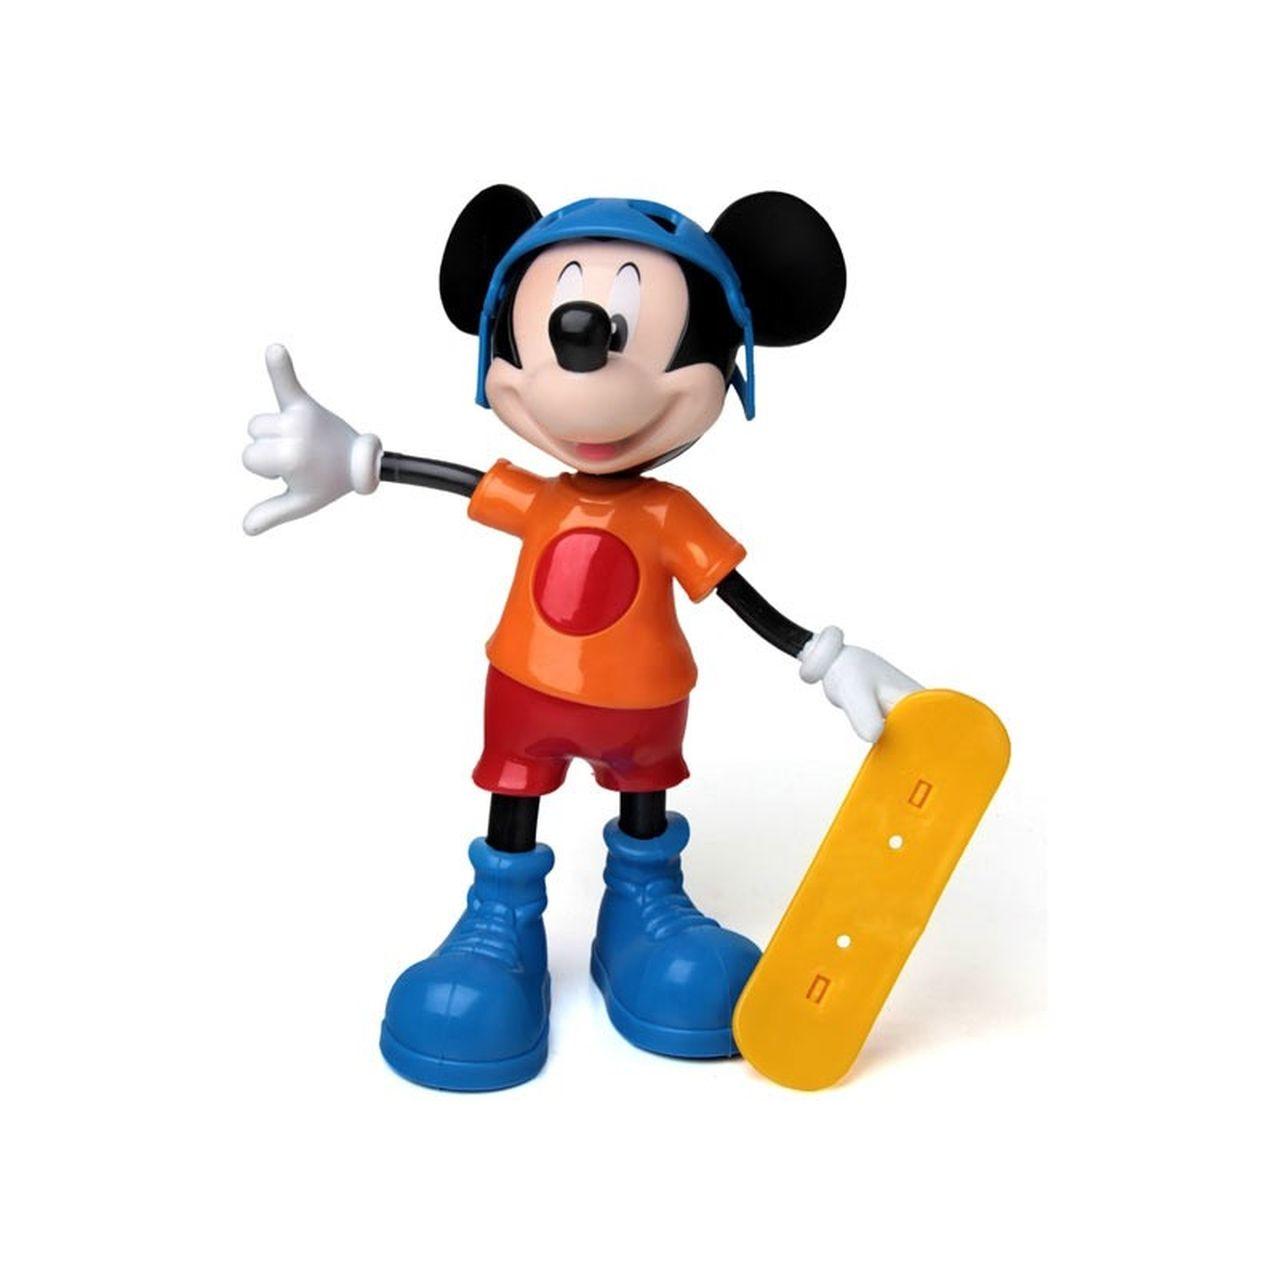 Boneco Mickey Radical Skate Disney 24cm - Elka